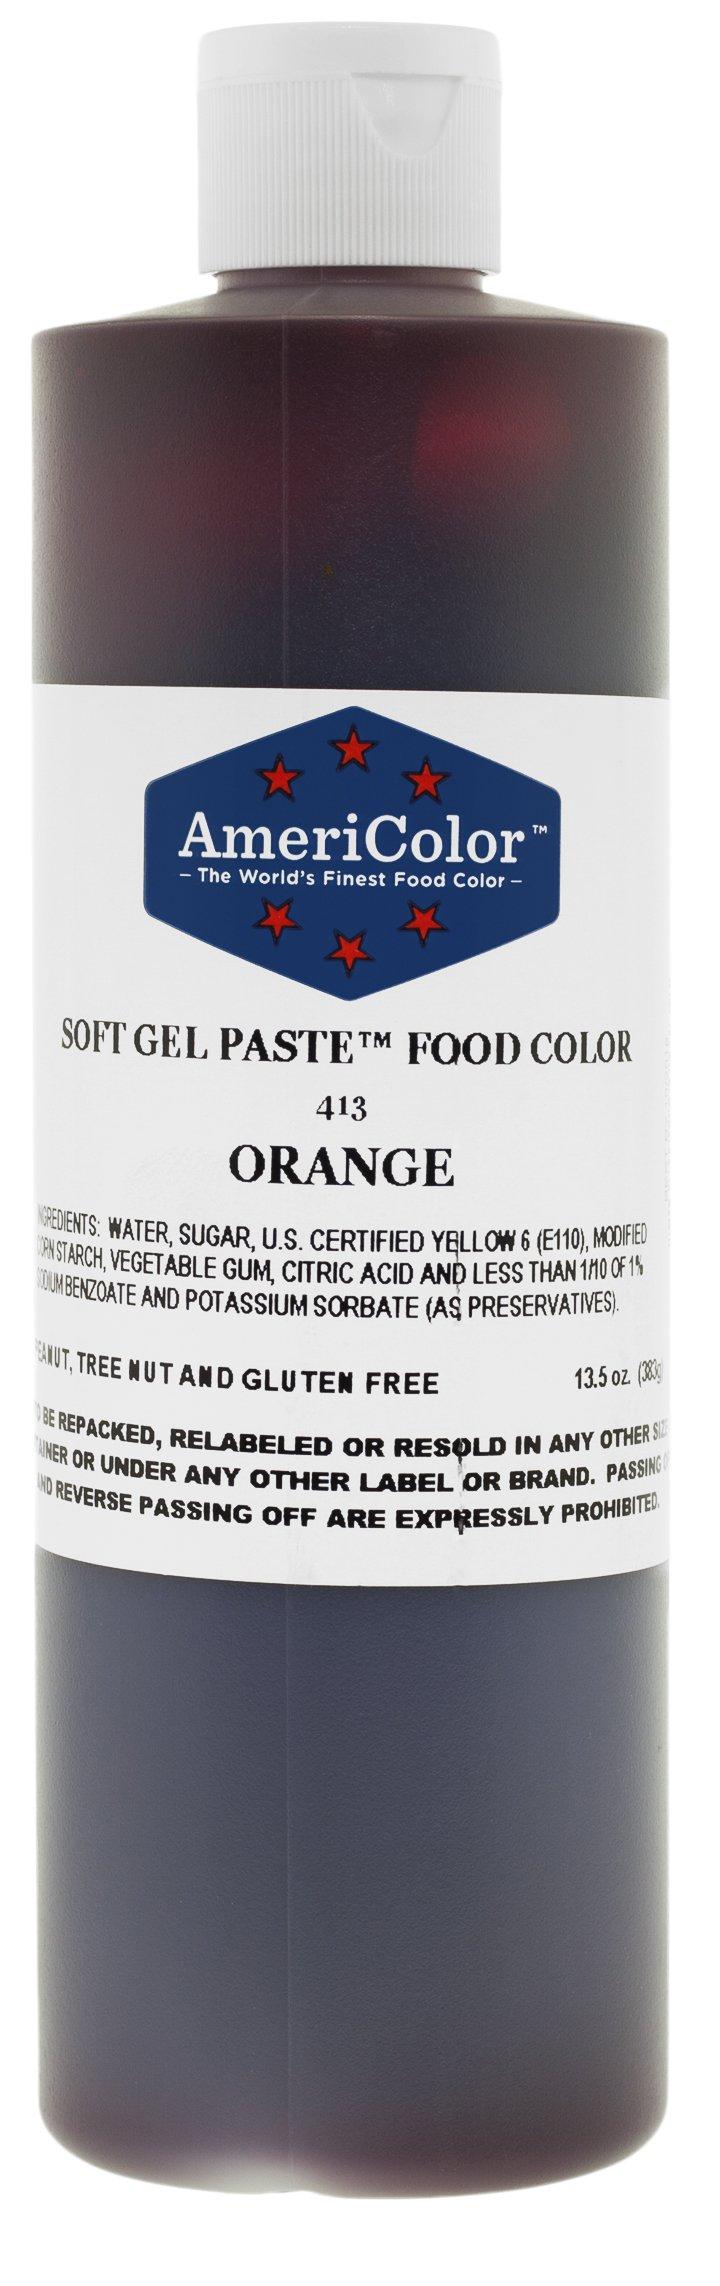 ORANGE 13.5 Ounce Soft Gel Paste Food Color